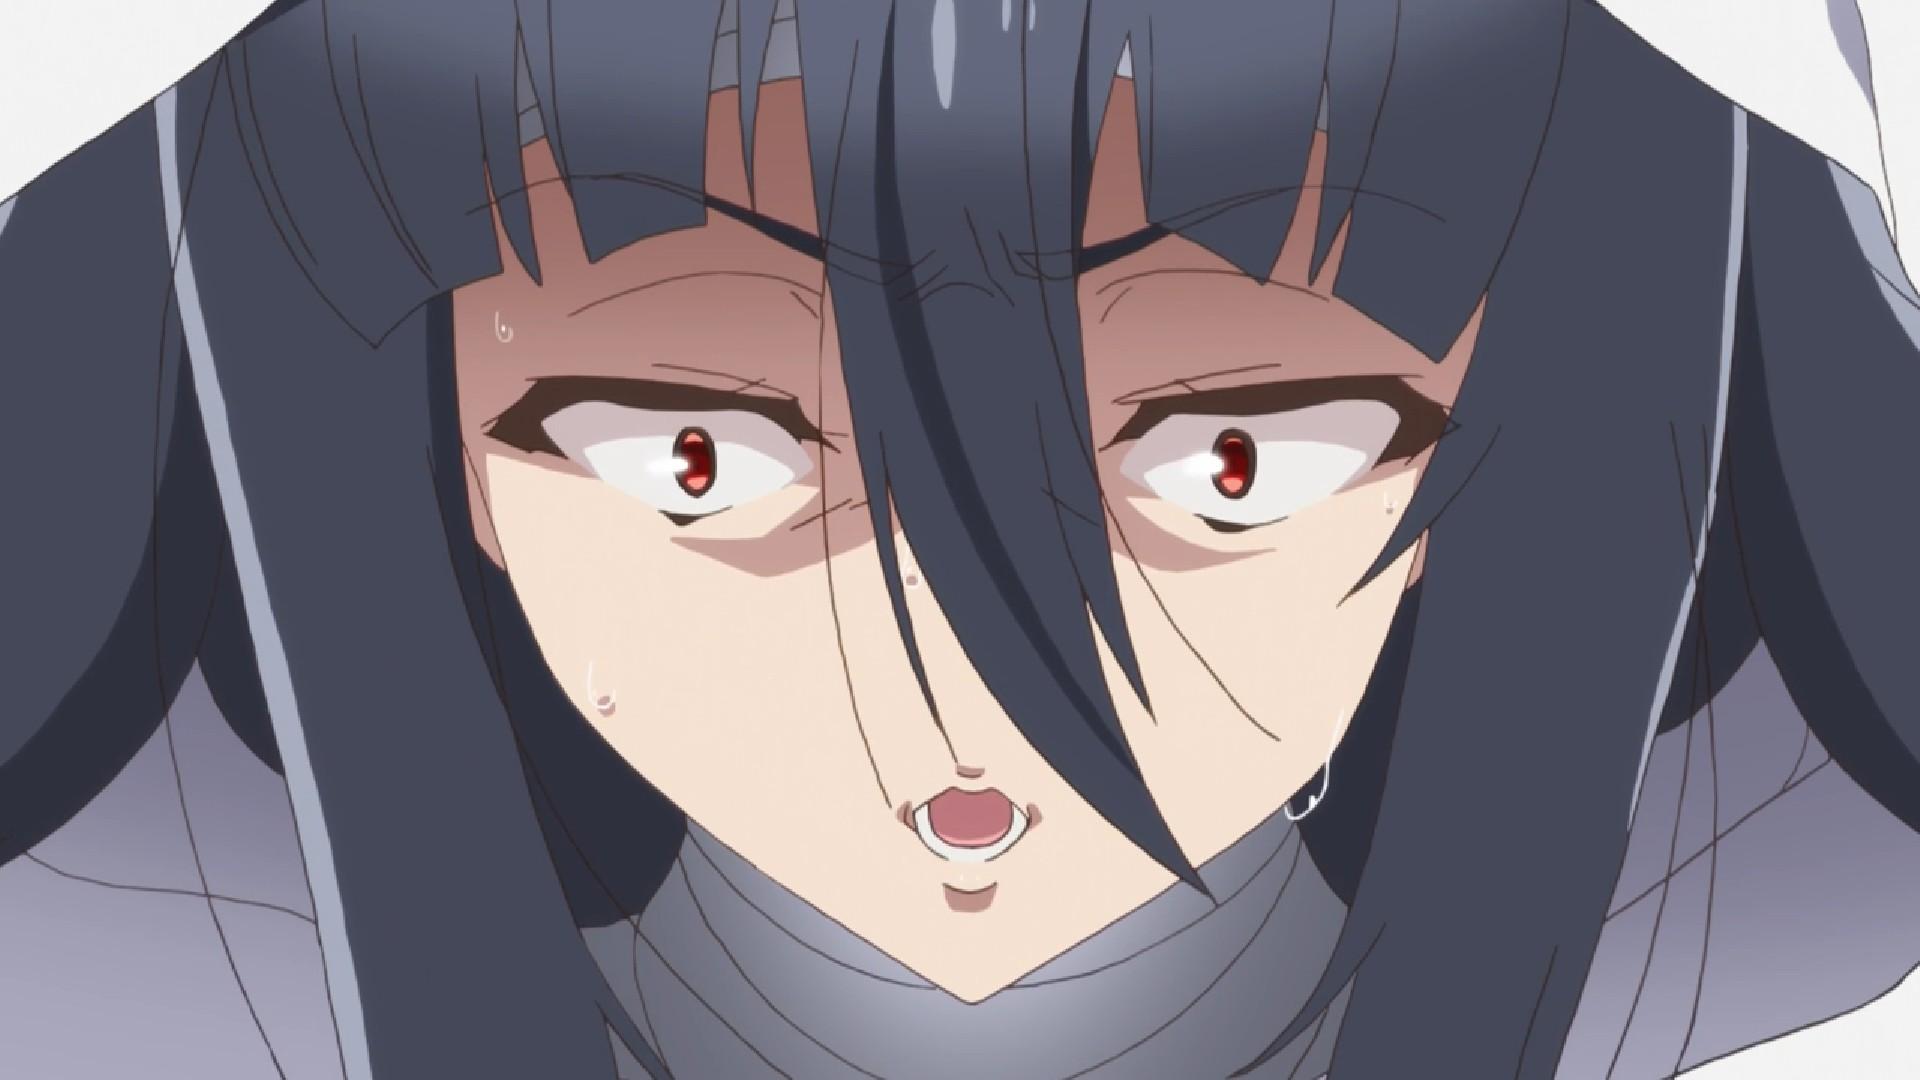 TVアニメ『ゾンビランドサガ』第5話「君の心にナイスバード SAGA」視聴感想[ネタバレあり]